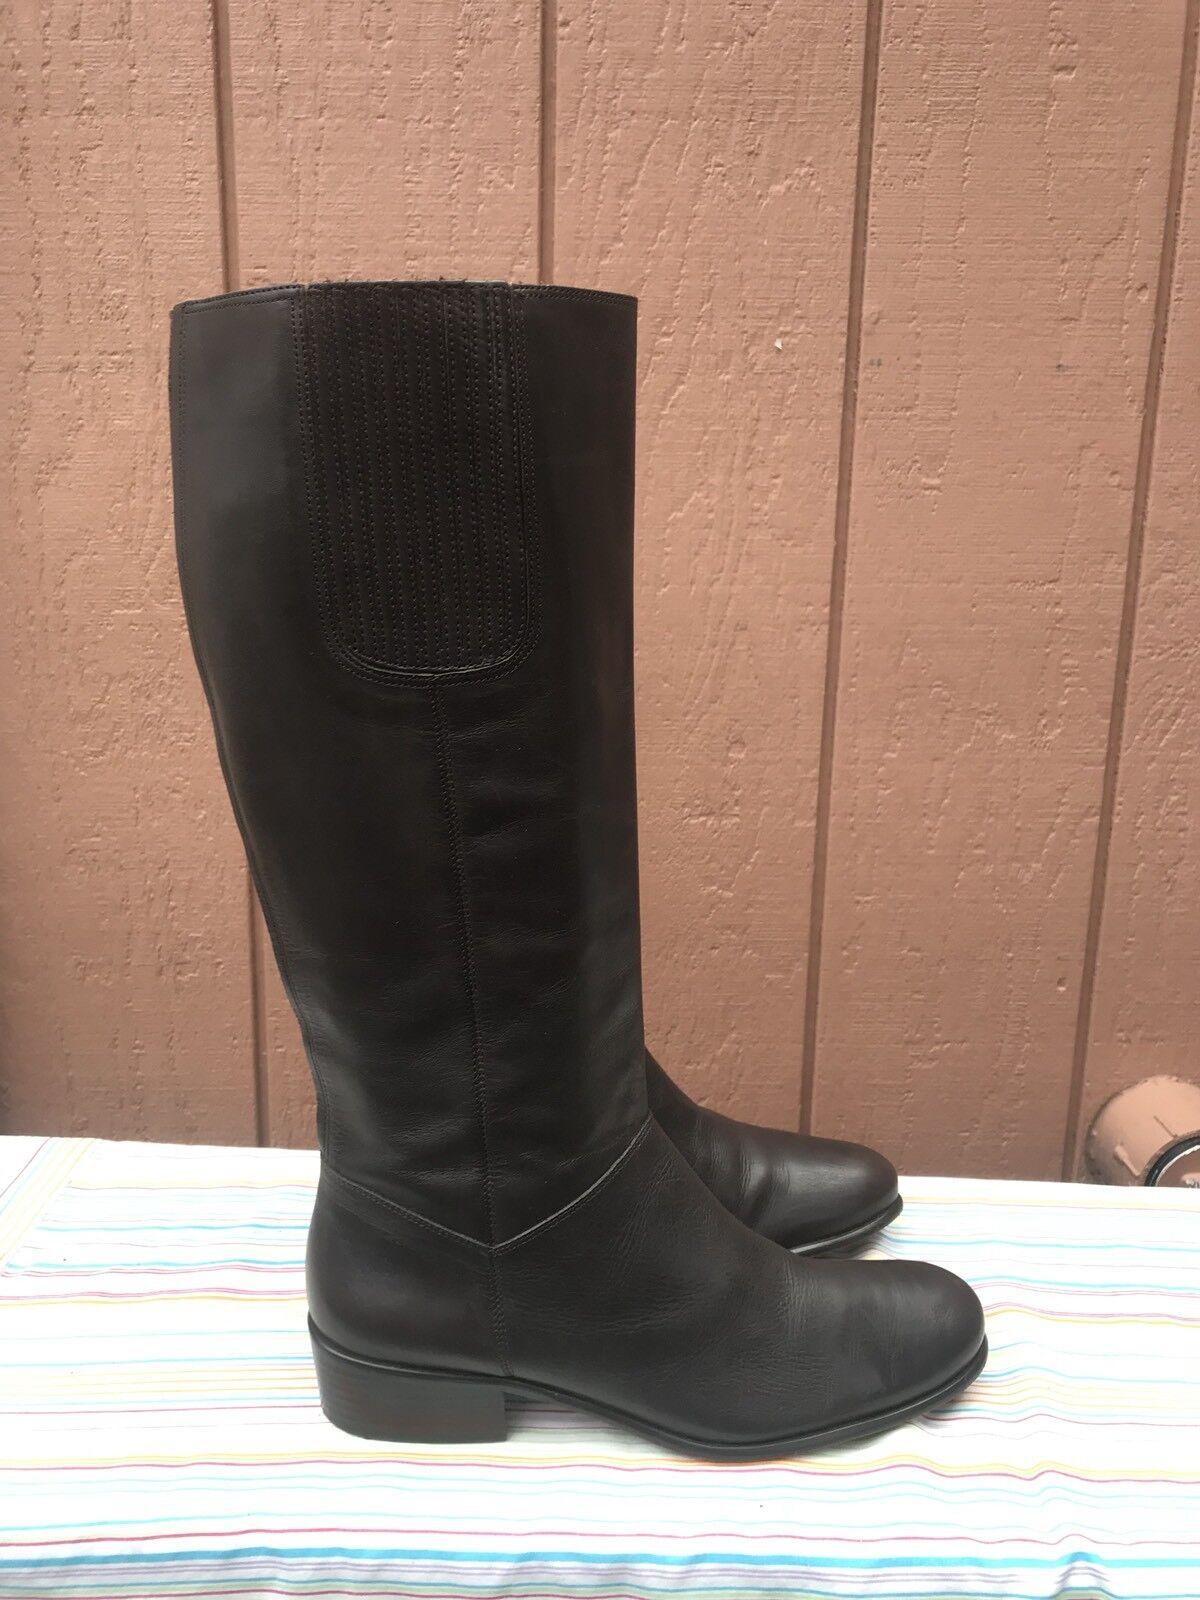 EUC Corso Como Brown Leather Knee High Riding Boots Women's US 10 M